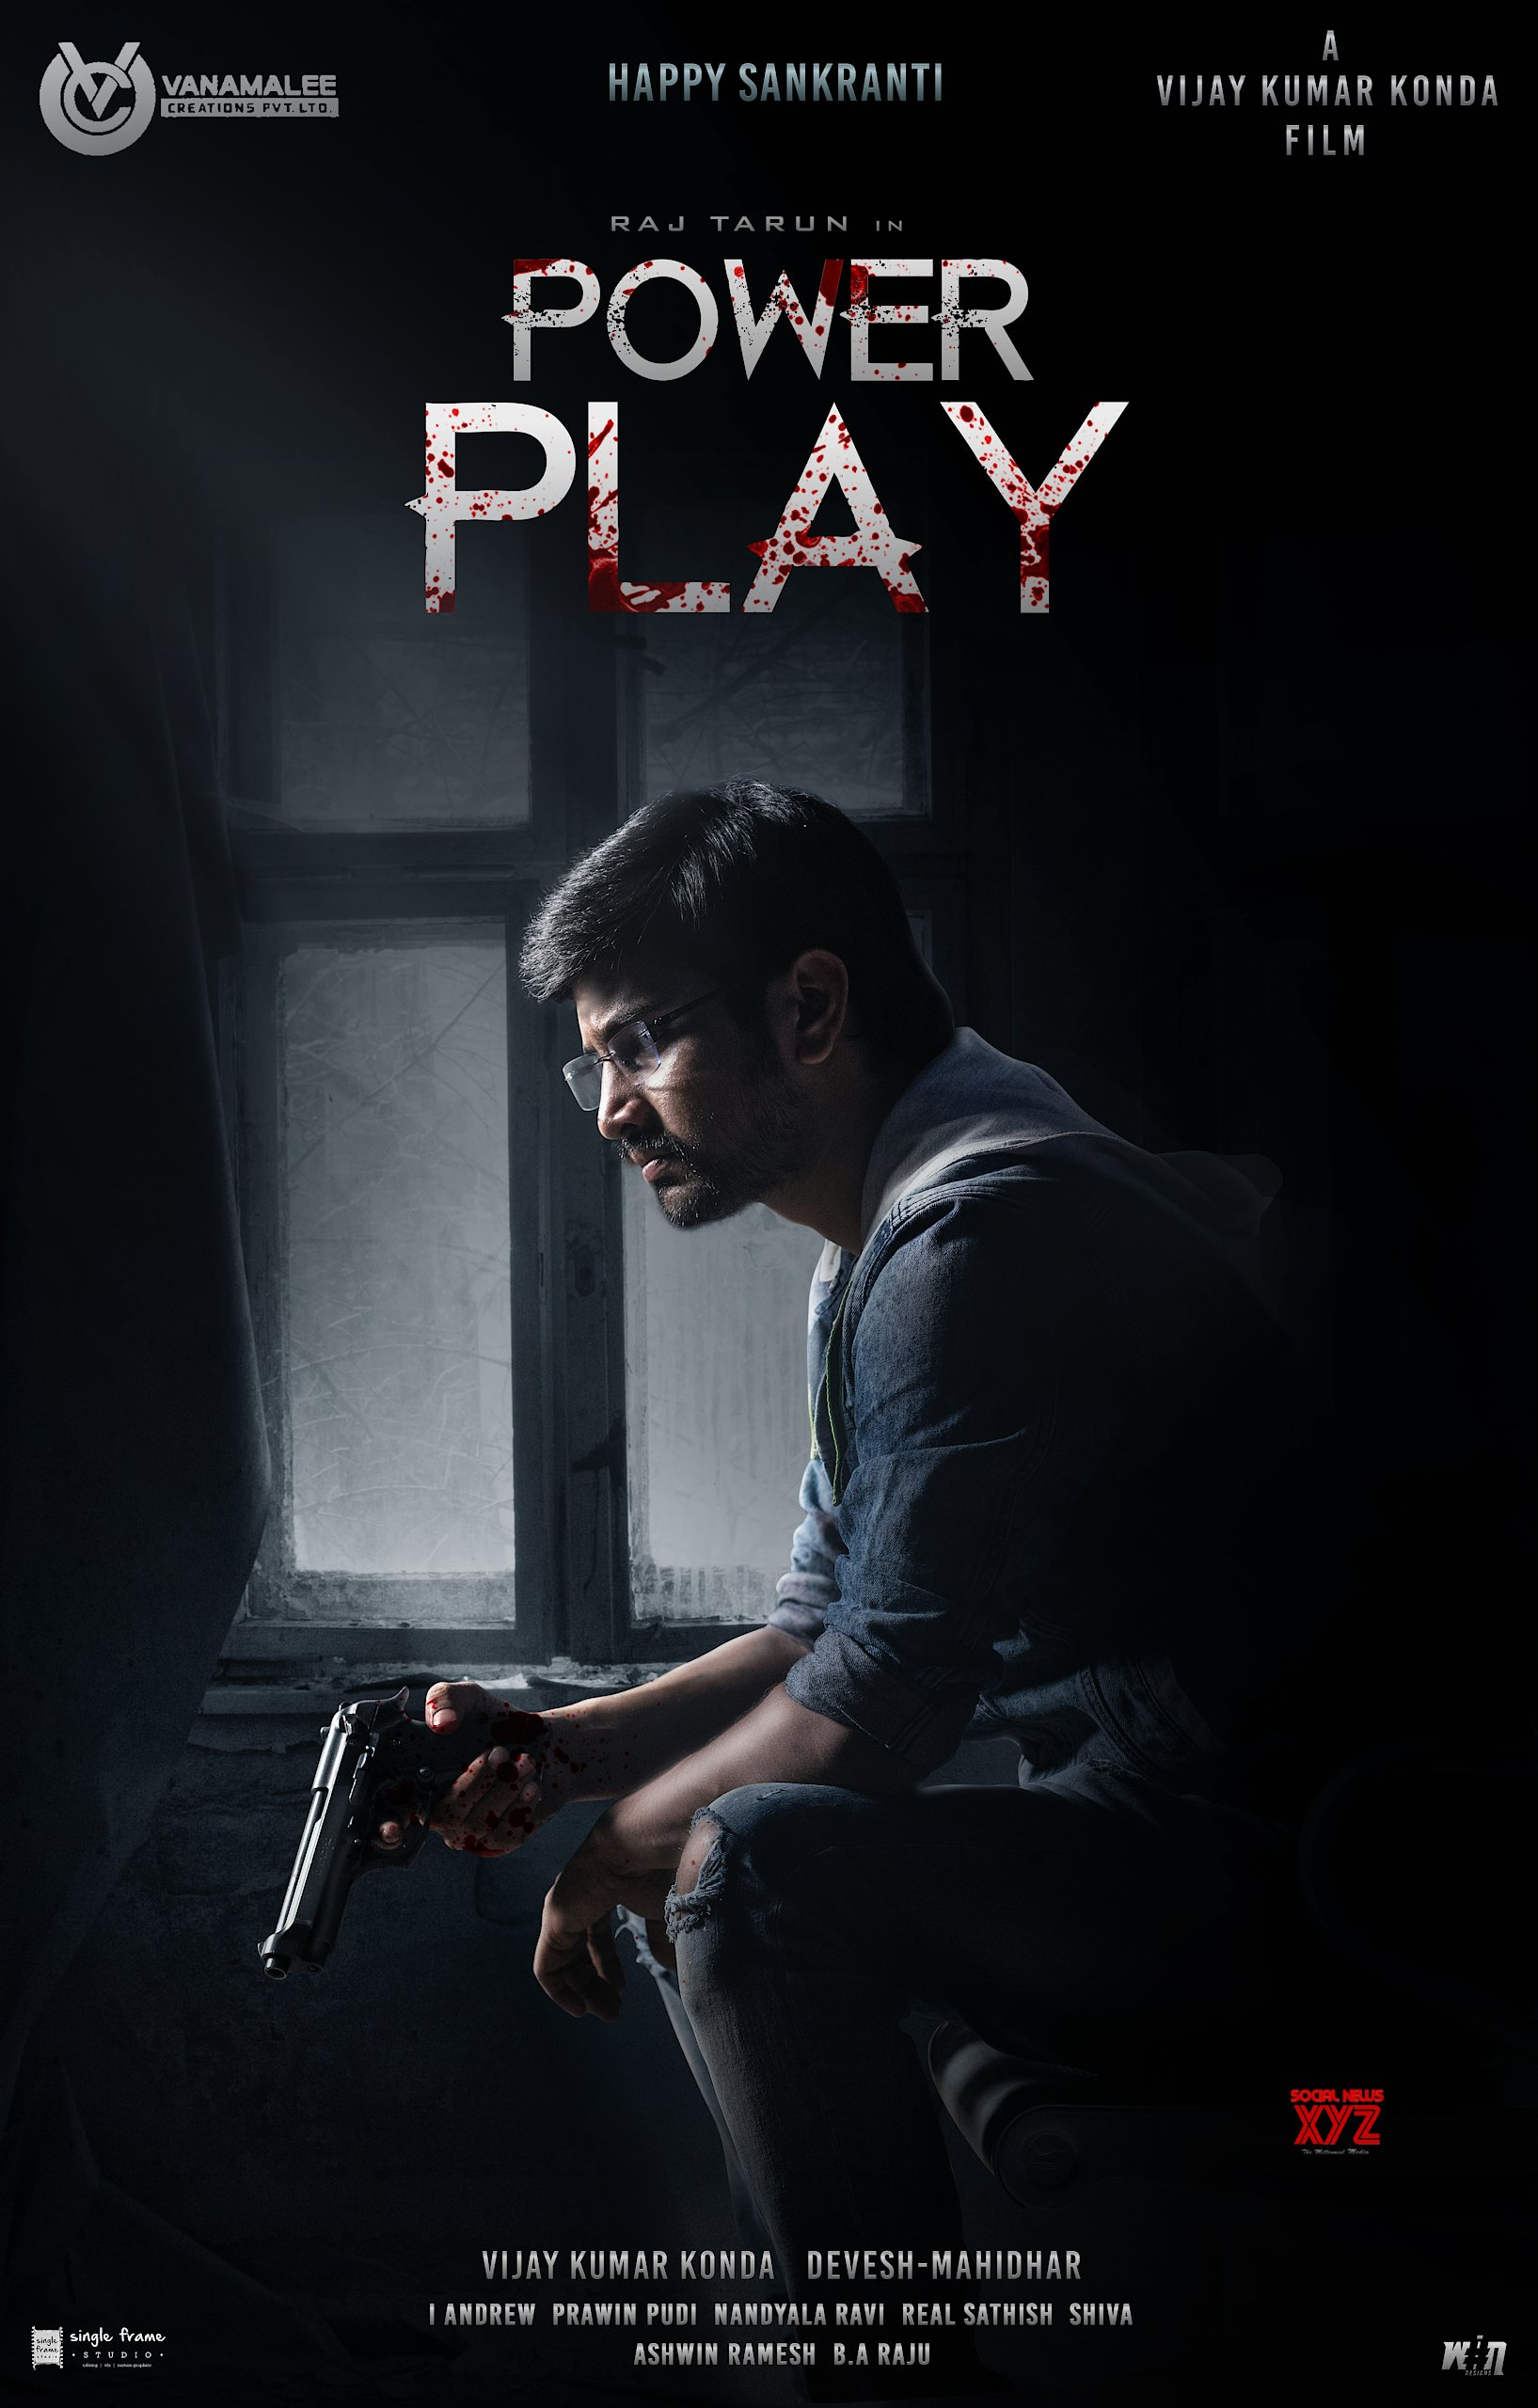 Versatile Hero Rana Daggubati Unveiled The First Look & Motion Poster Of Raj Tarun, Vijay Kumar Konda's 'Power Play'